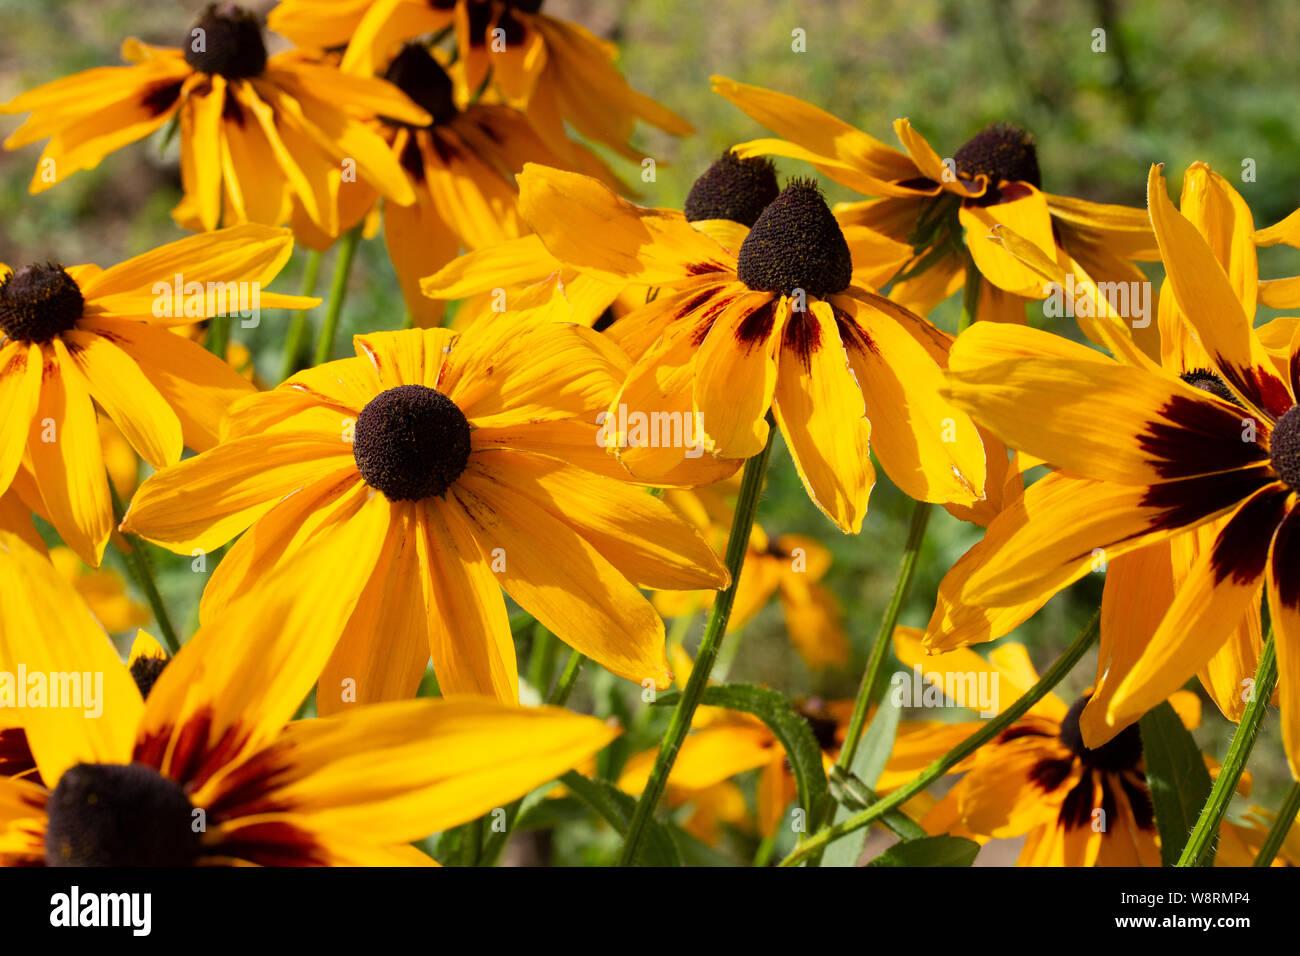 Yellow Flowers Rudbeckia Garden Decorative Flower Background Wallpaper Stock Photo Alamy